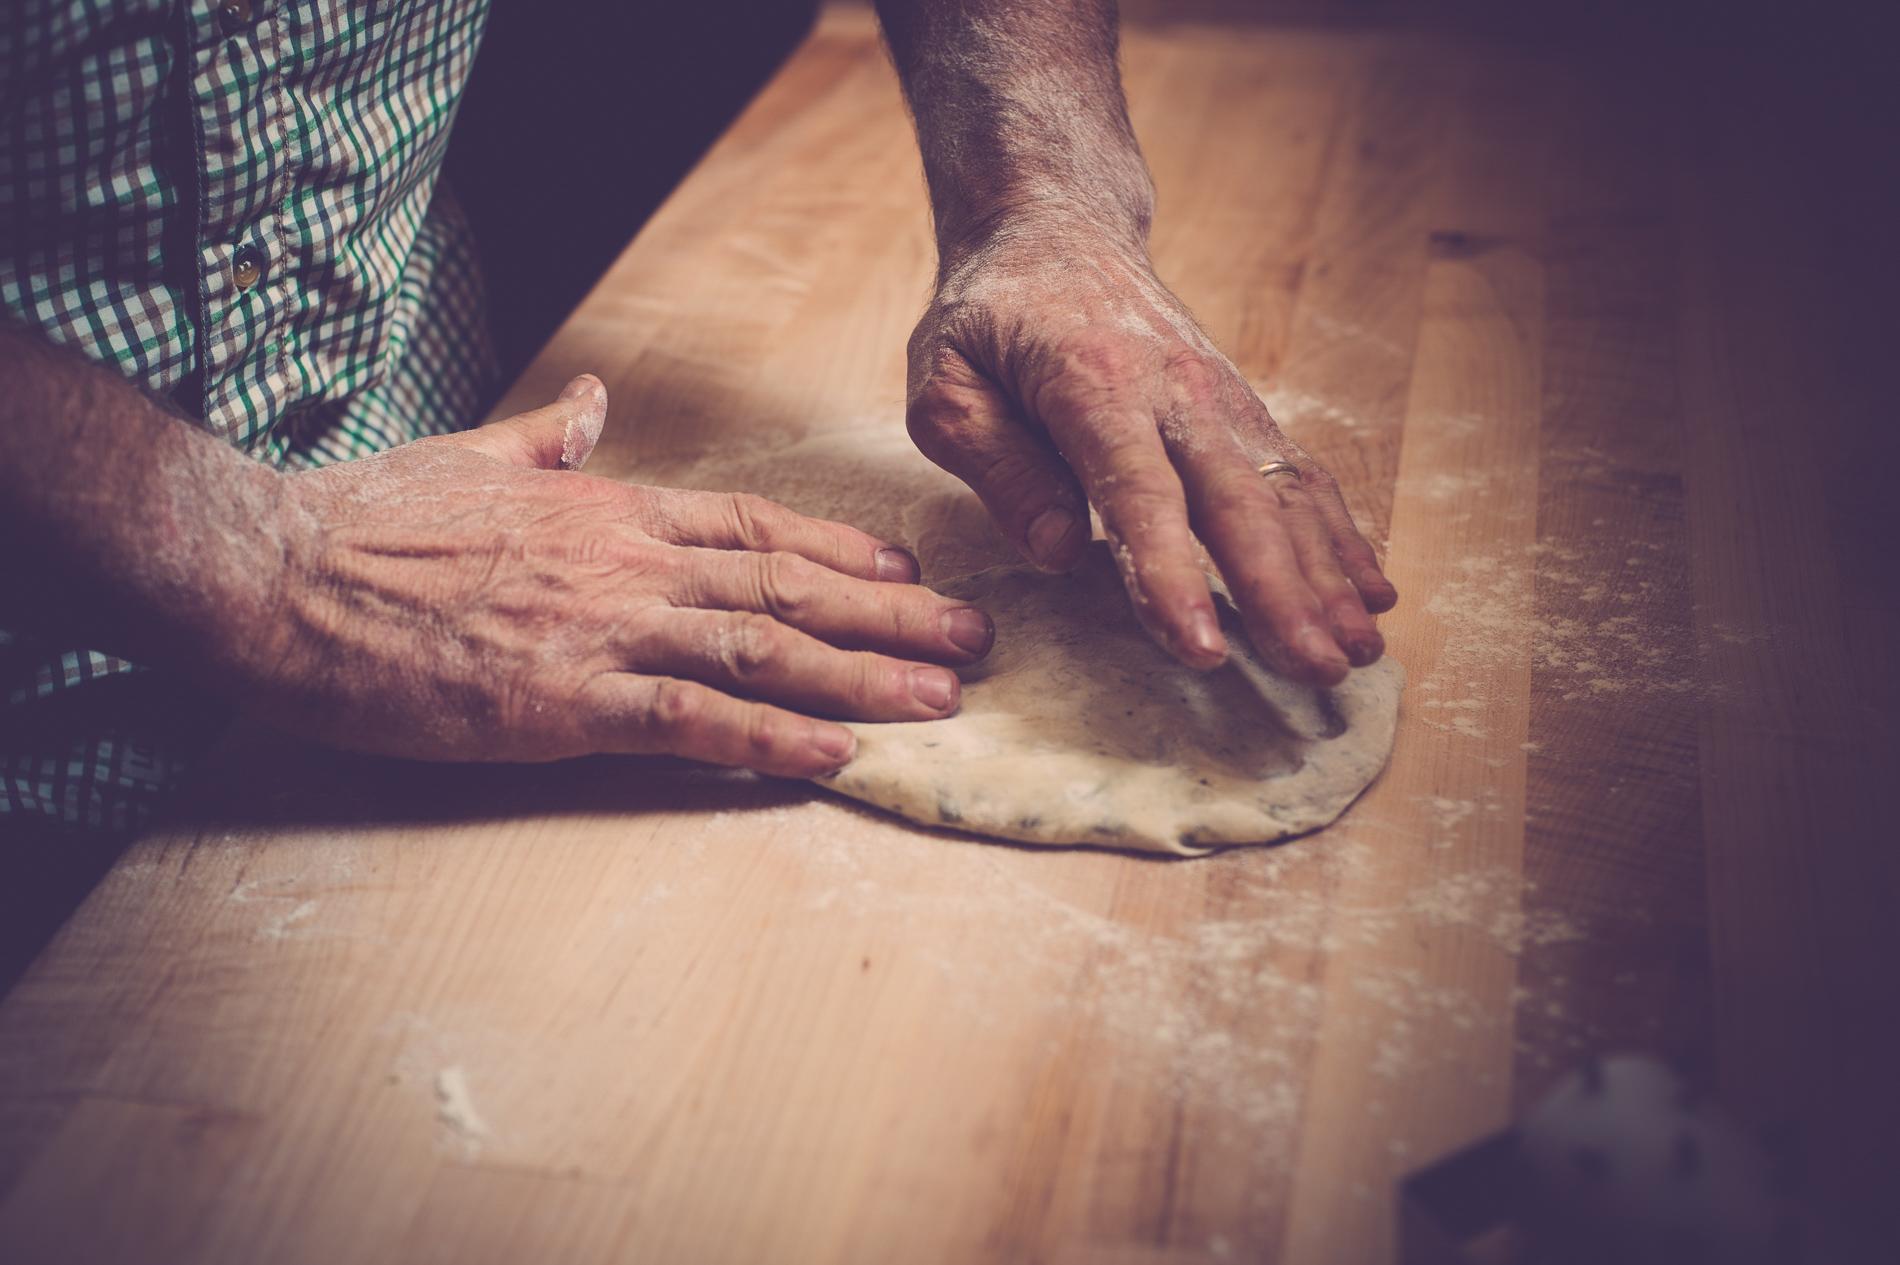 Handmade Pizza Photography